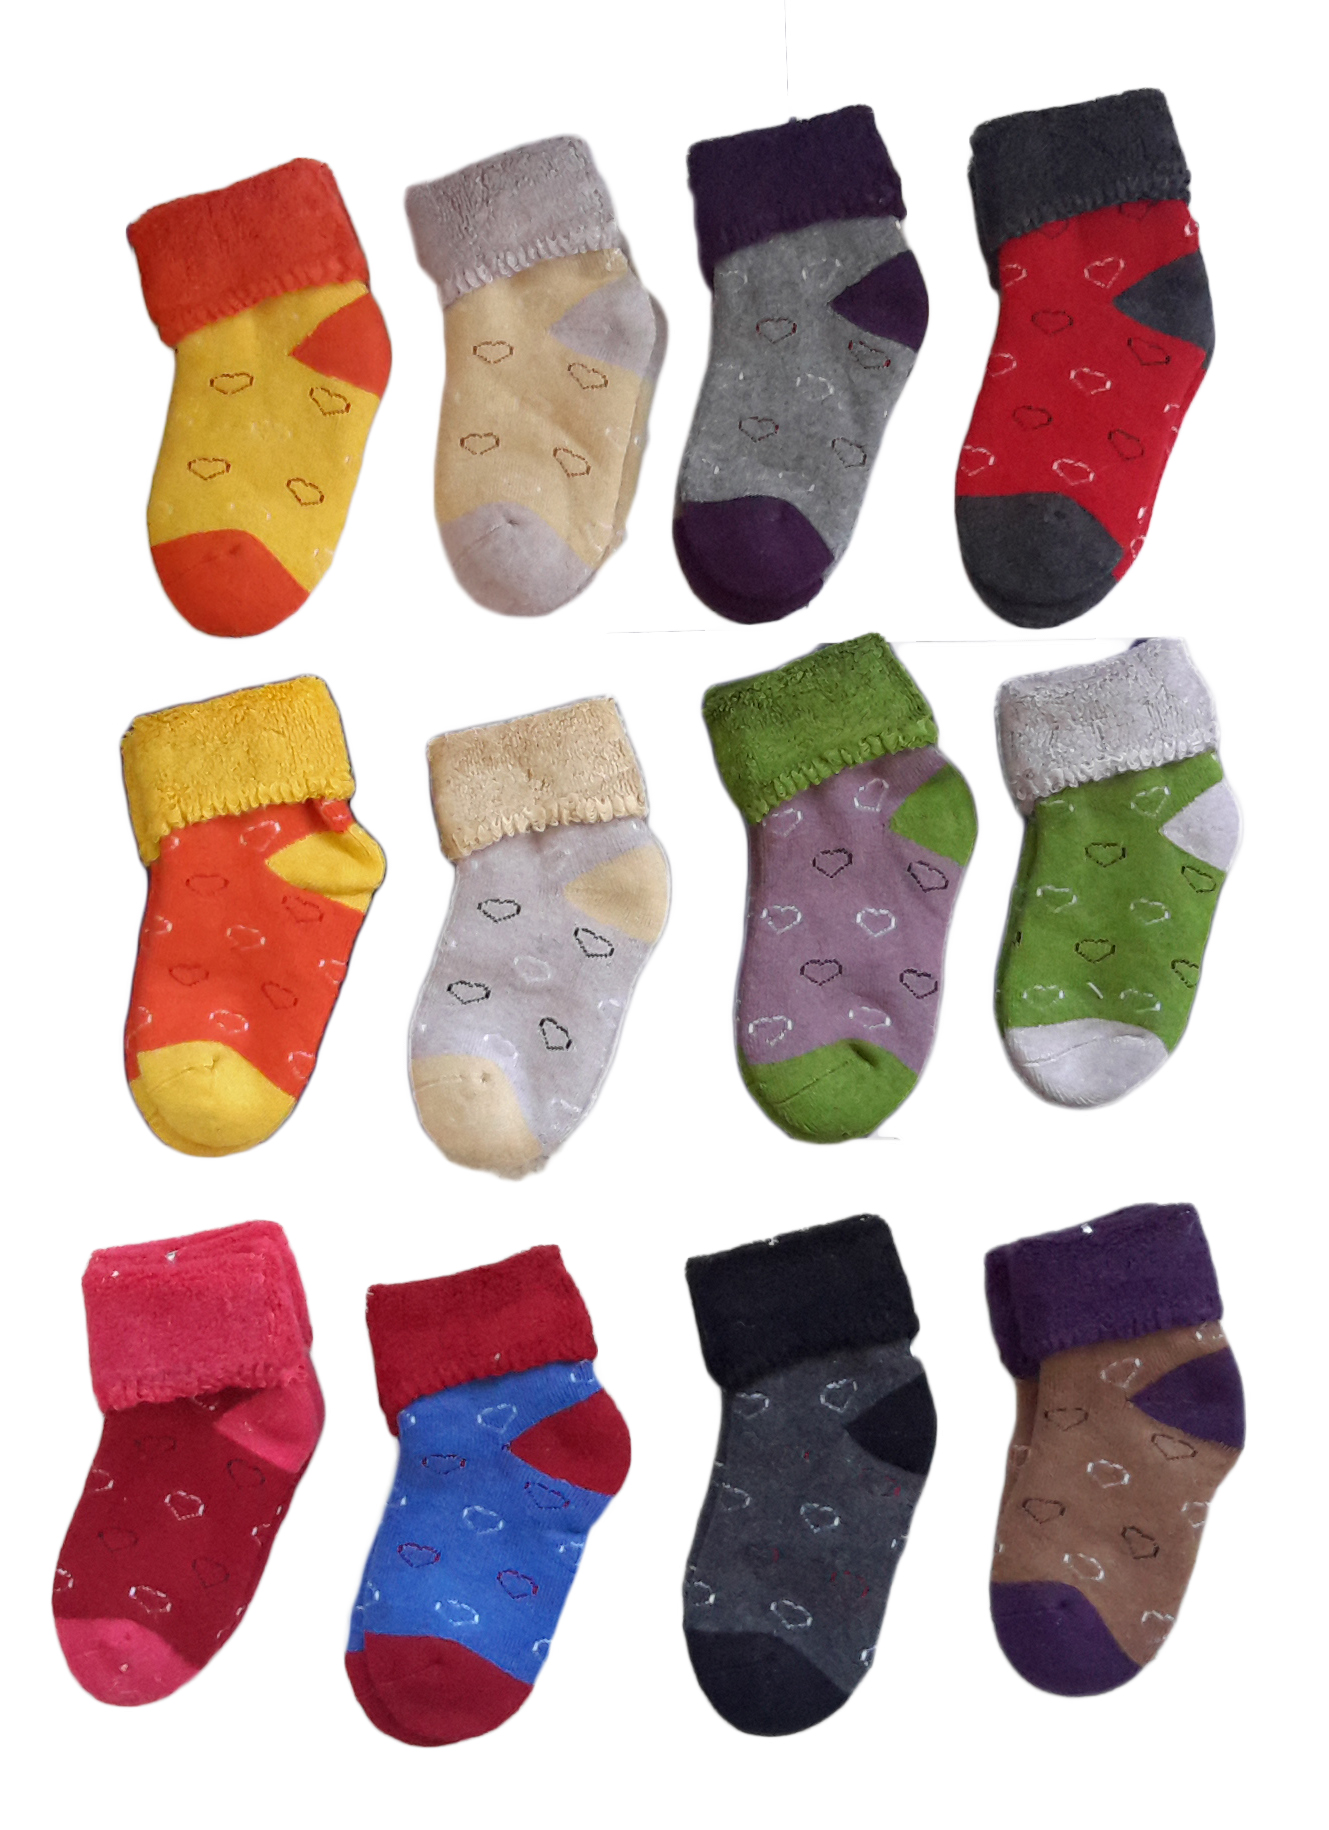 Lovely Annie 2 Pairs Children Cashmere Wool Socks Heart B 12M-36M Random Color